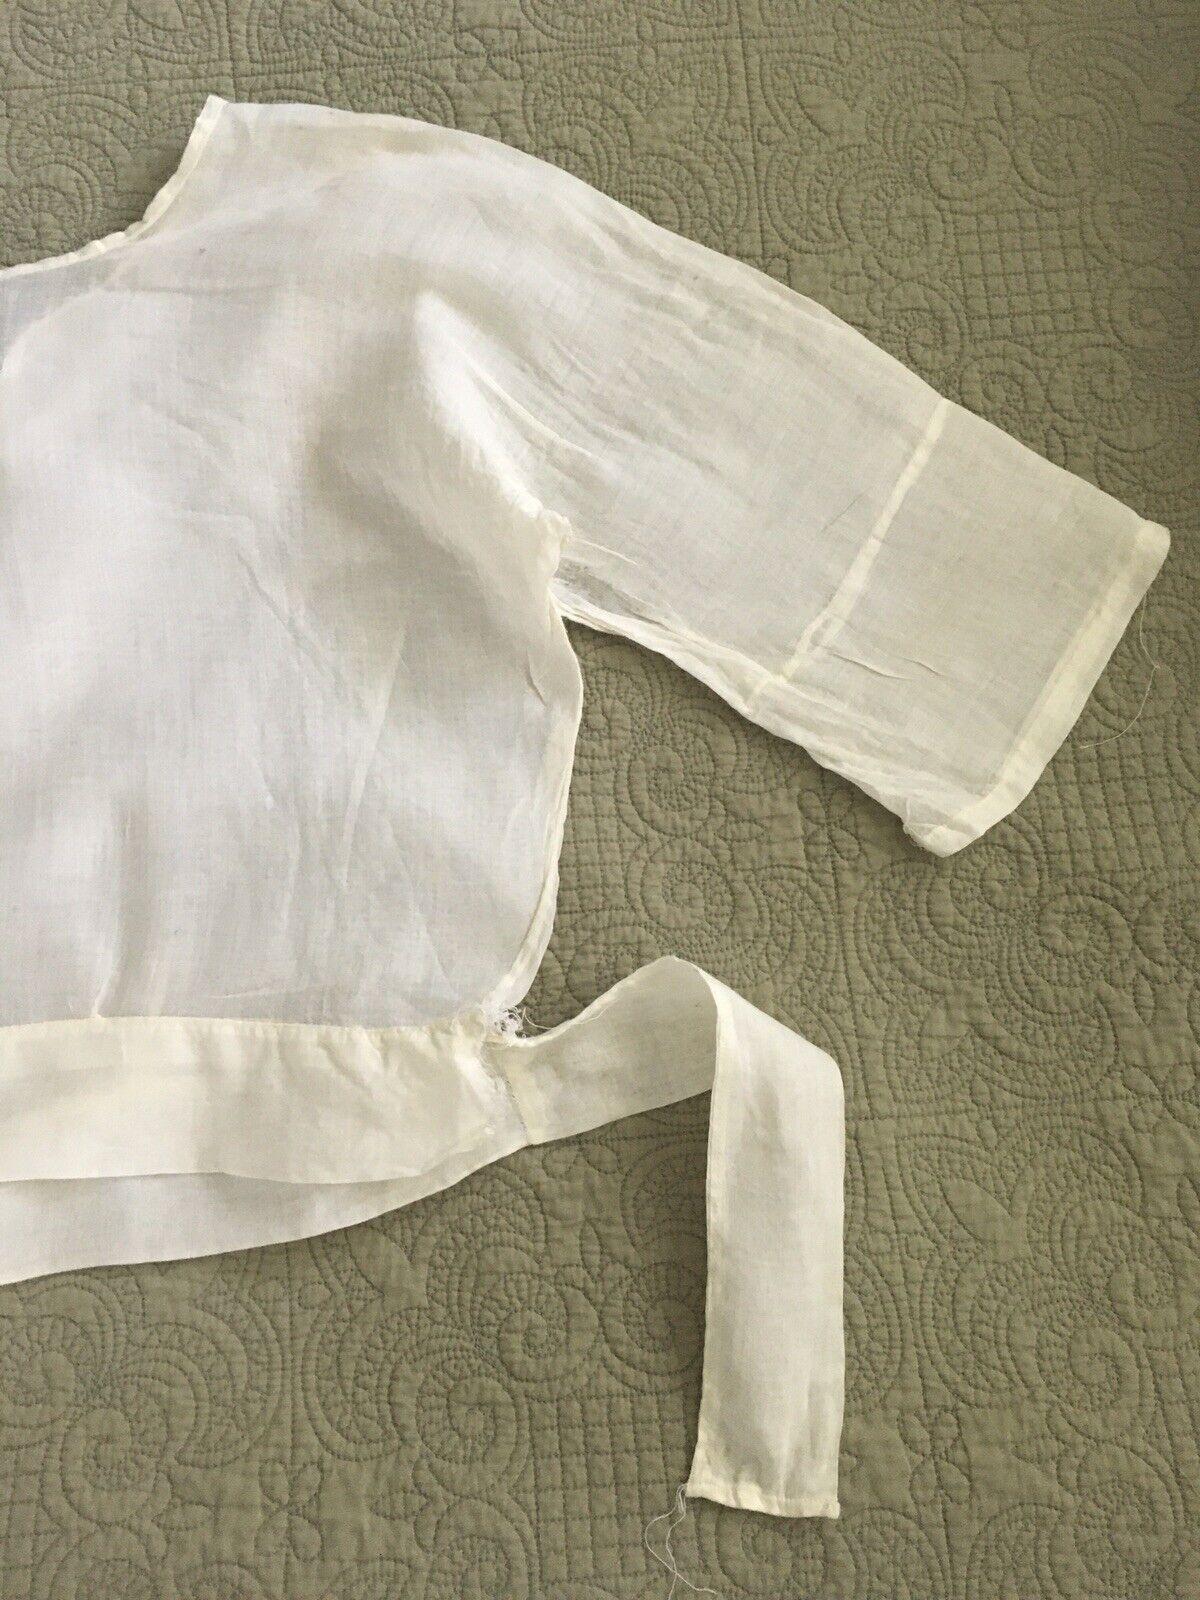 Antique Edwardian Victorian Shirtwaist Blouse - image 8